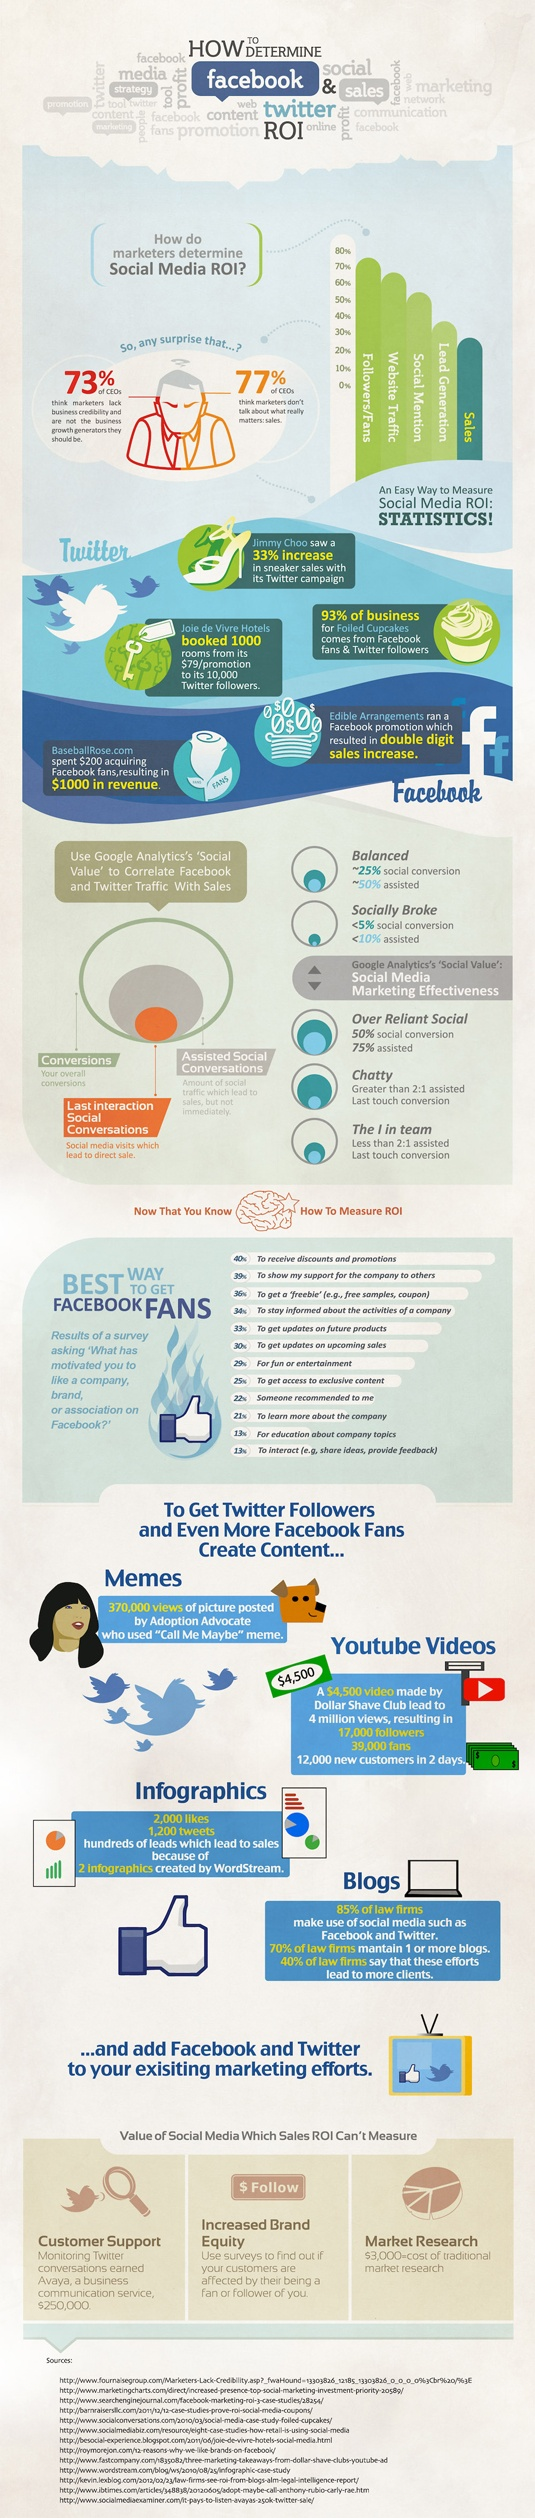 ROI no #facebook e no #twitter.